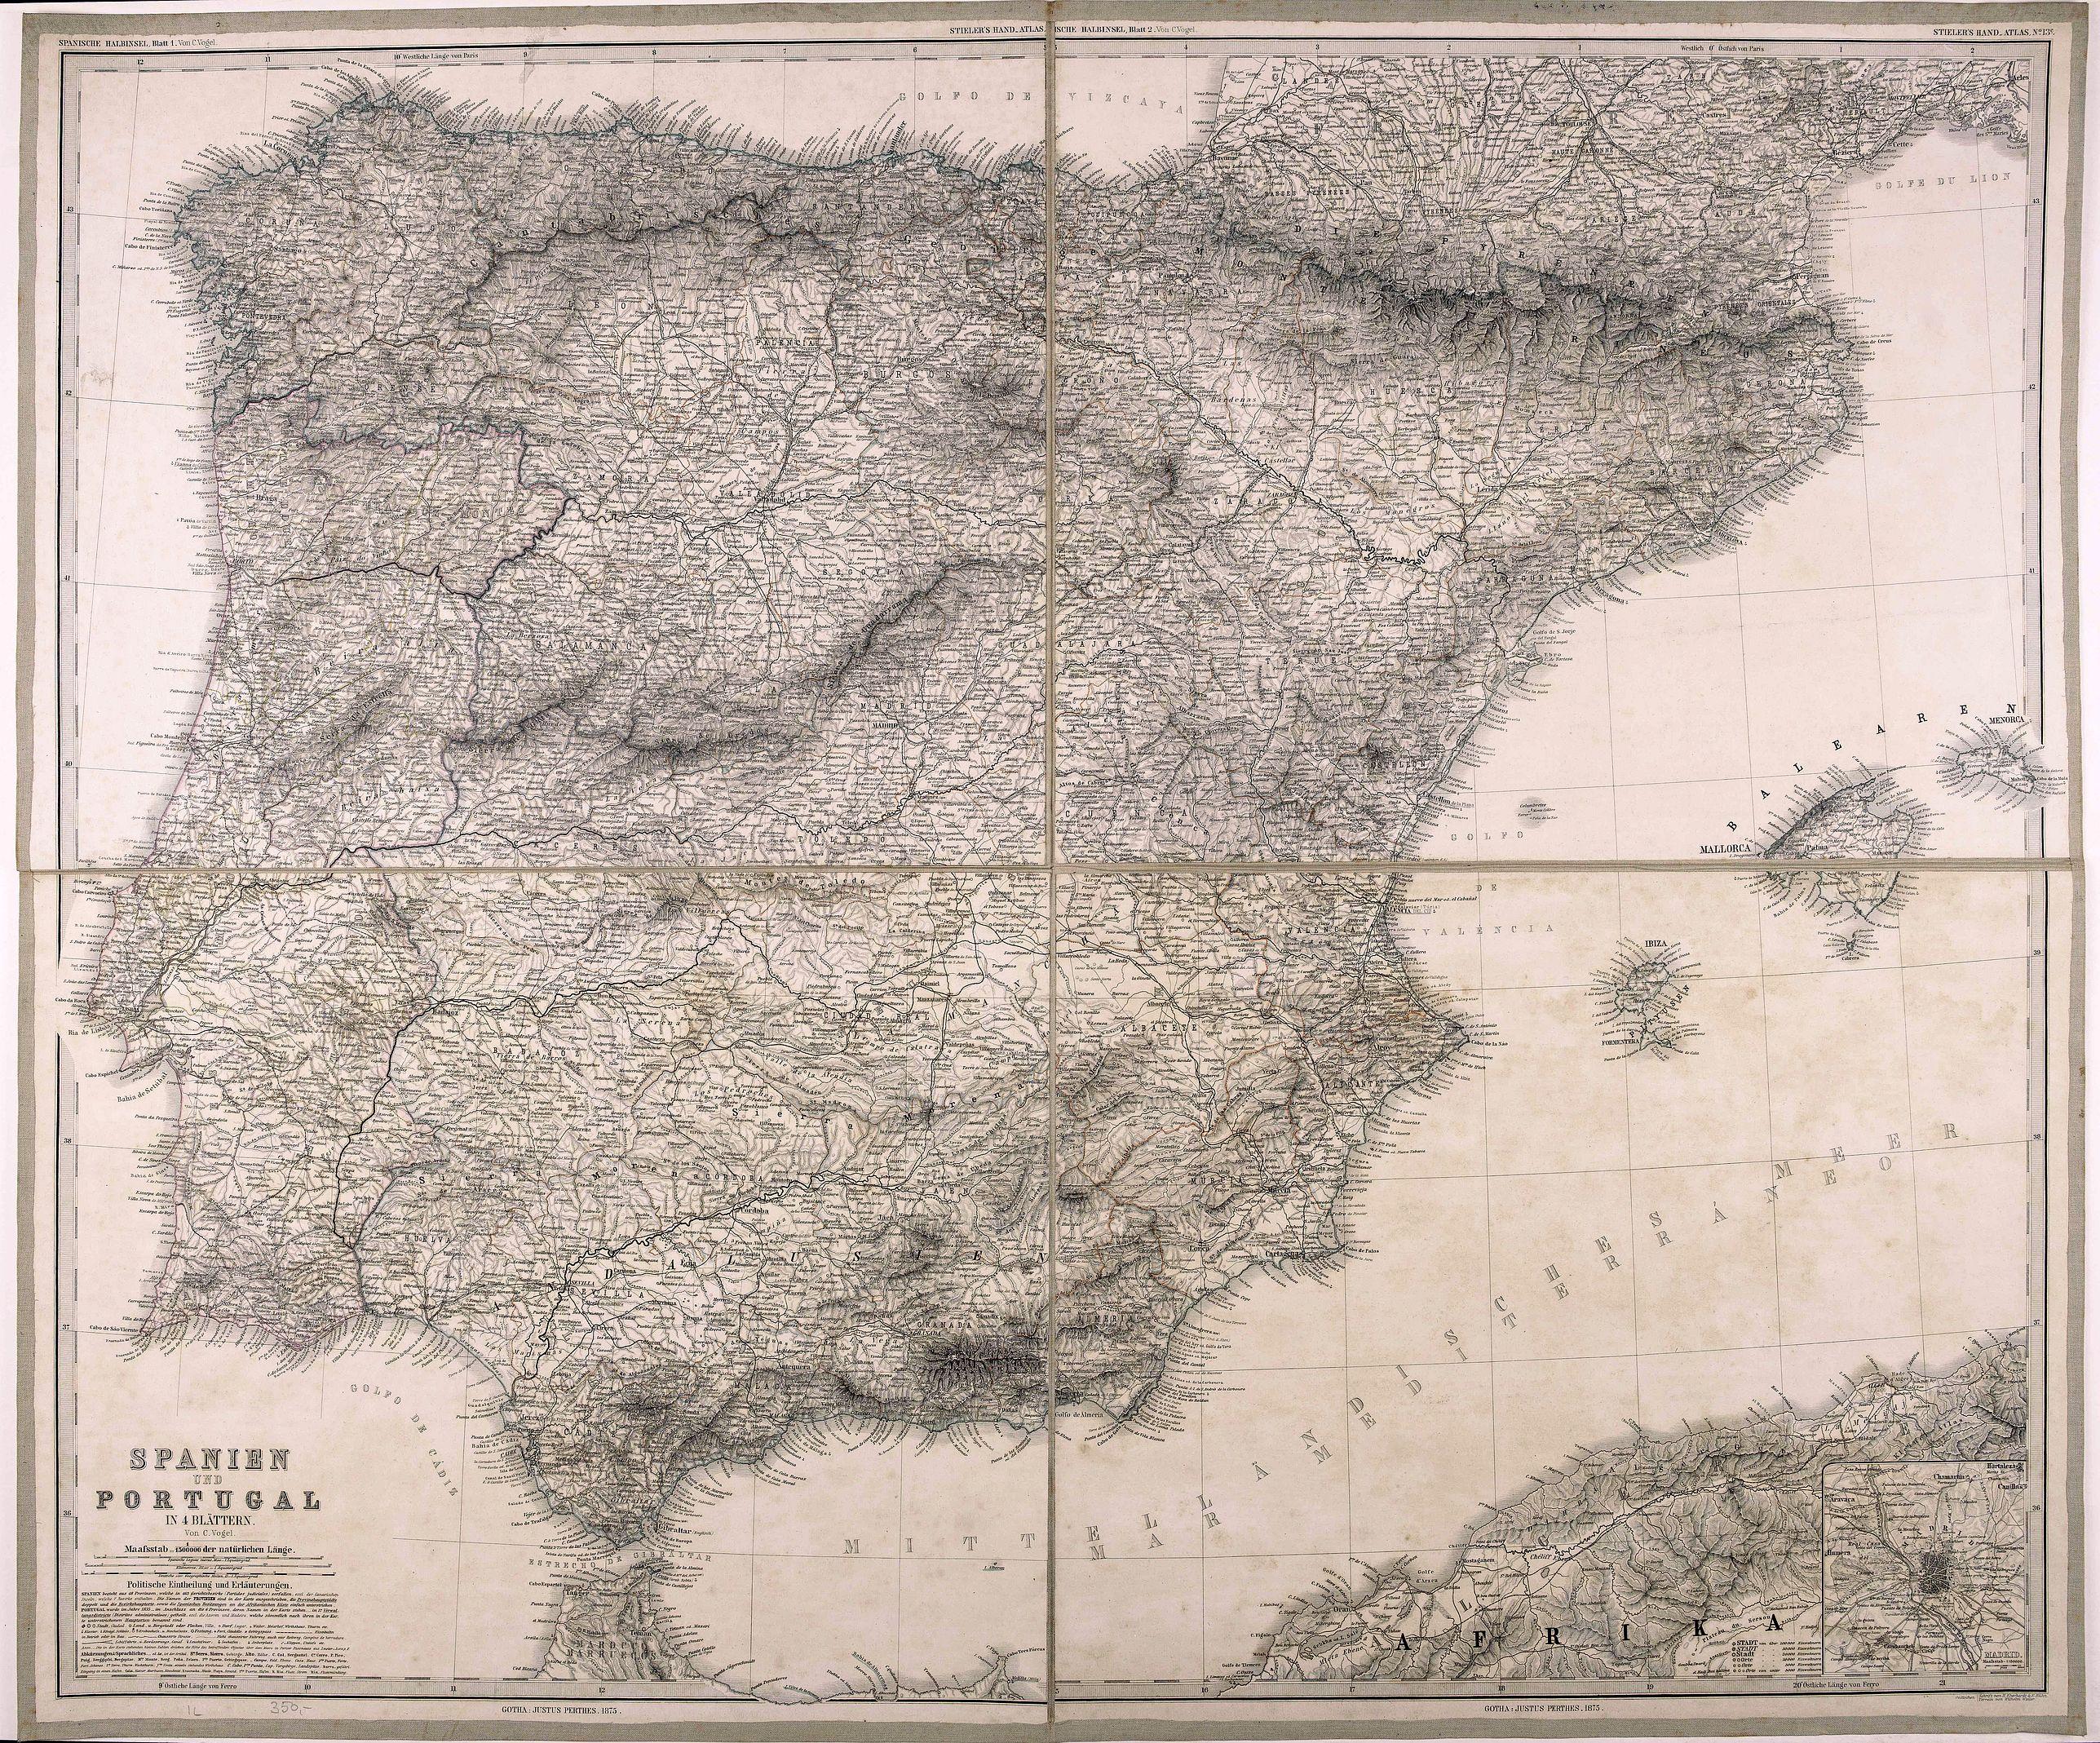 PERTHES, J. - Spanien und Portugal.